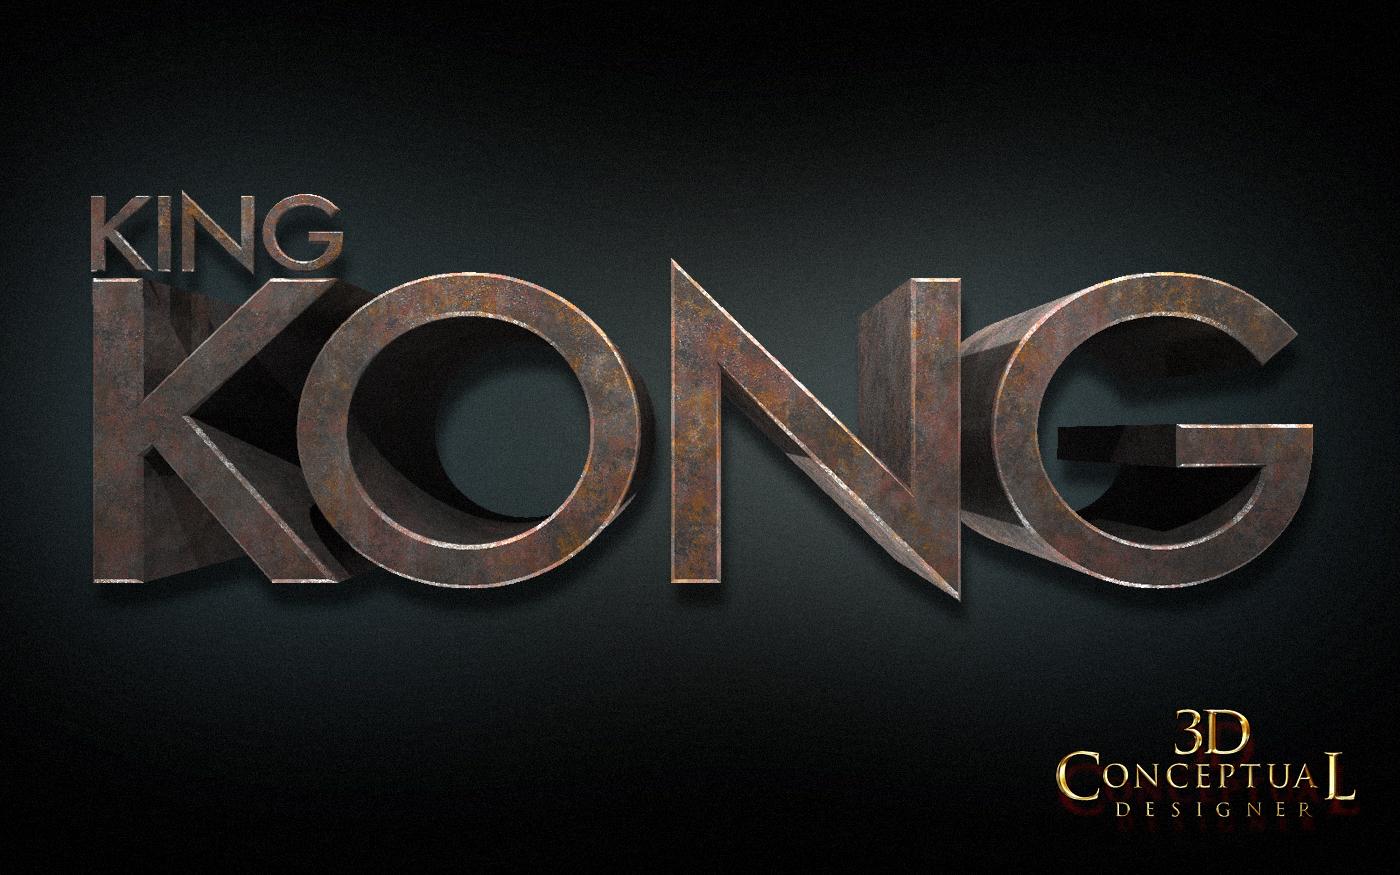 3dconceptualdesignerblog project review king kong 2005 3d logo designs part iii - King kong design ...